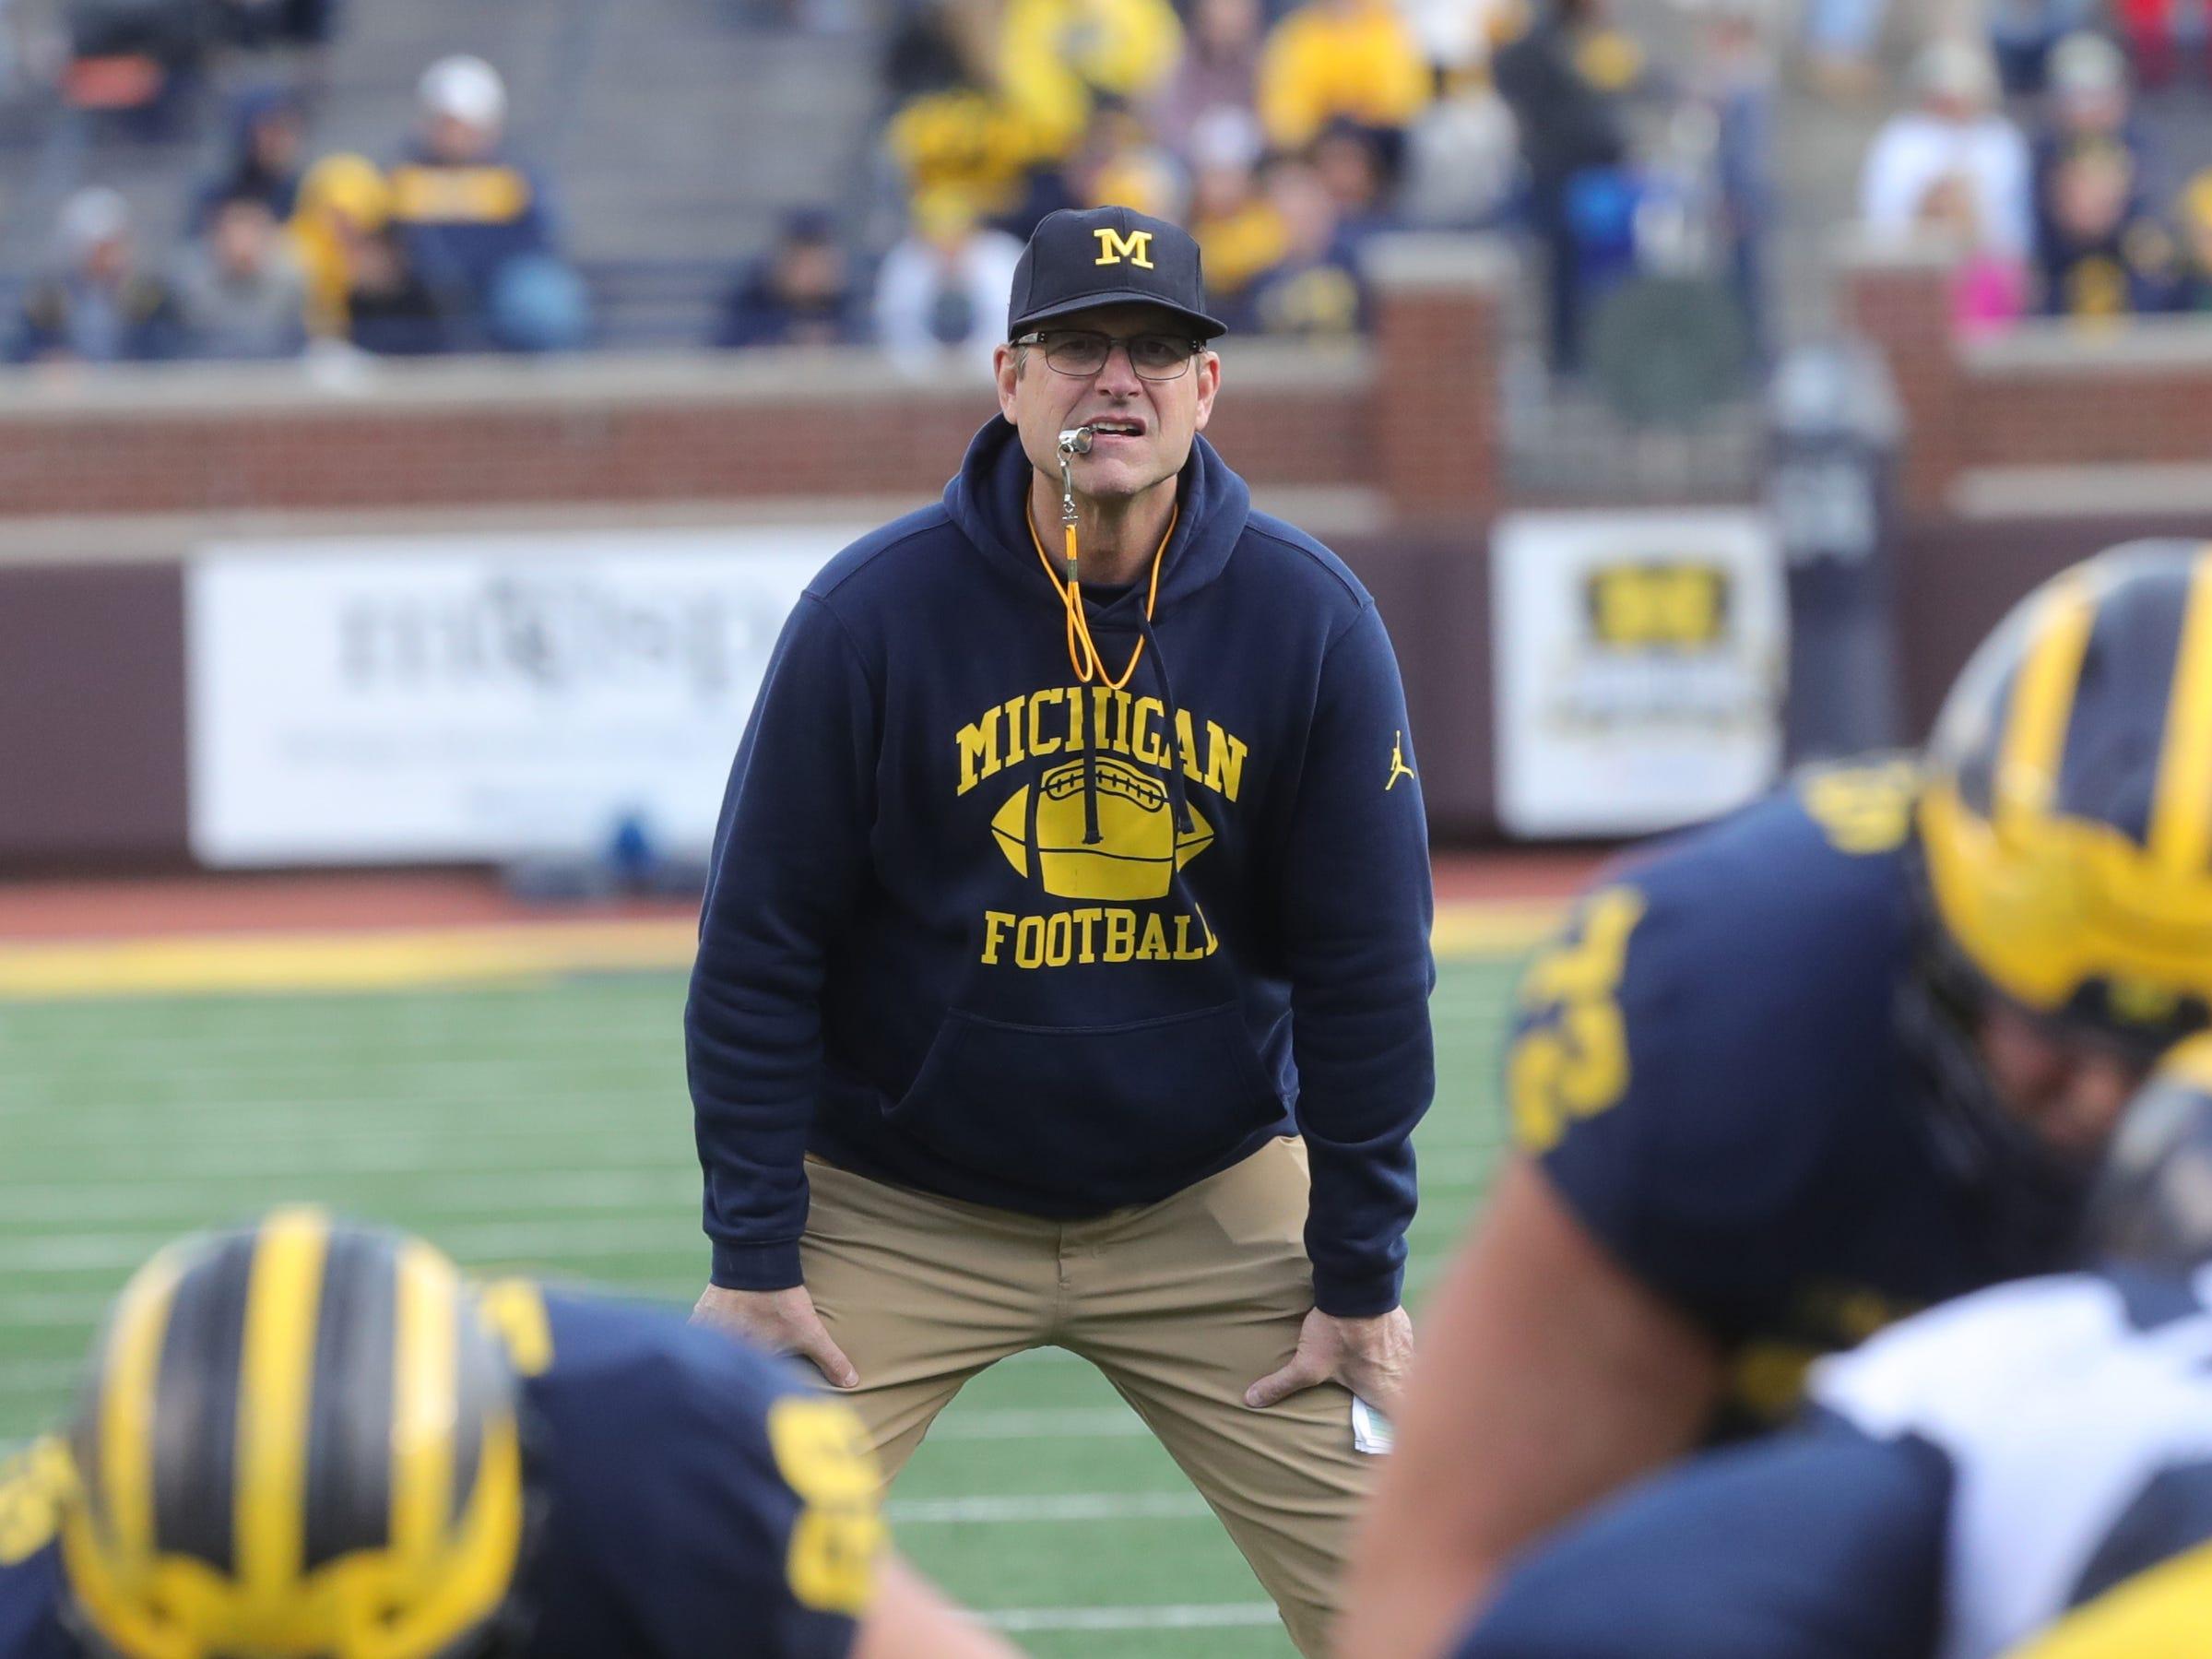 Michigan head coach Jim Harbaugh watches the spring game Saturday, April 13, 2019 at Michigan Stadium in Ann Arbor.